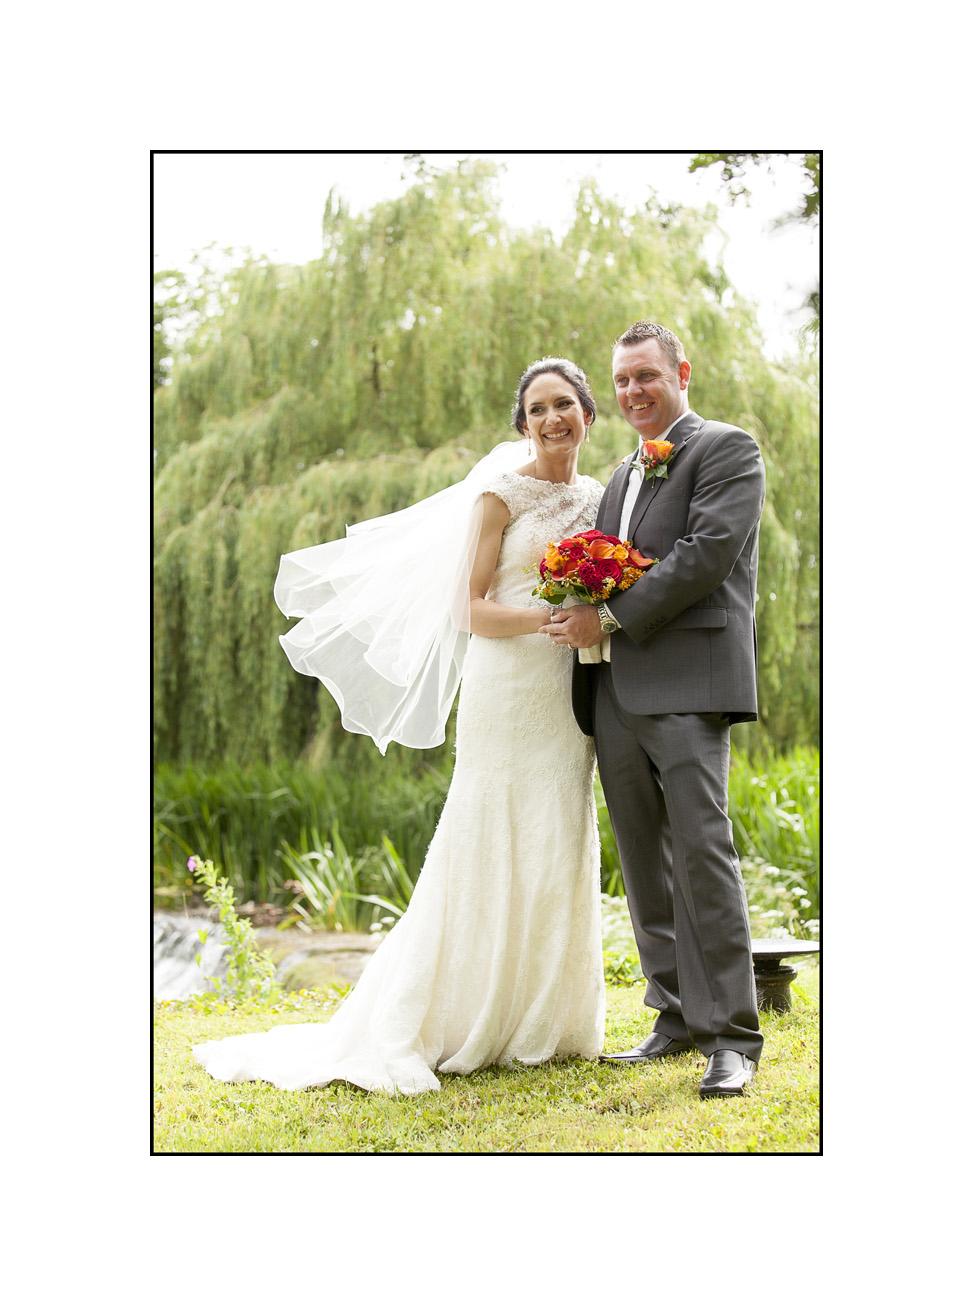 Modern Reportage Wedding Photography in Ireland and Northern Ireland